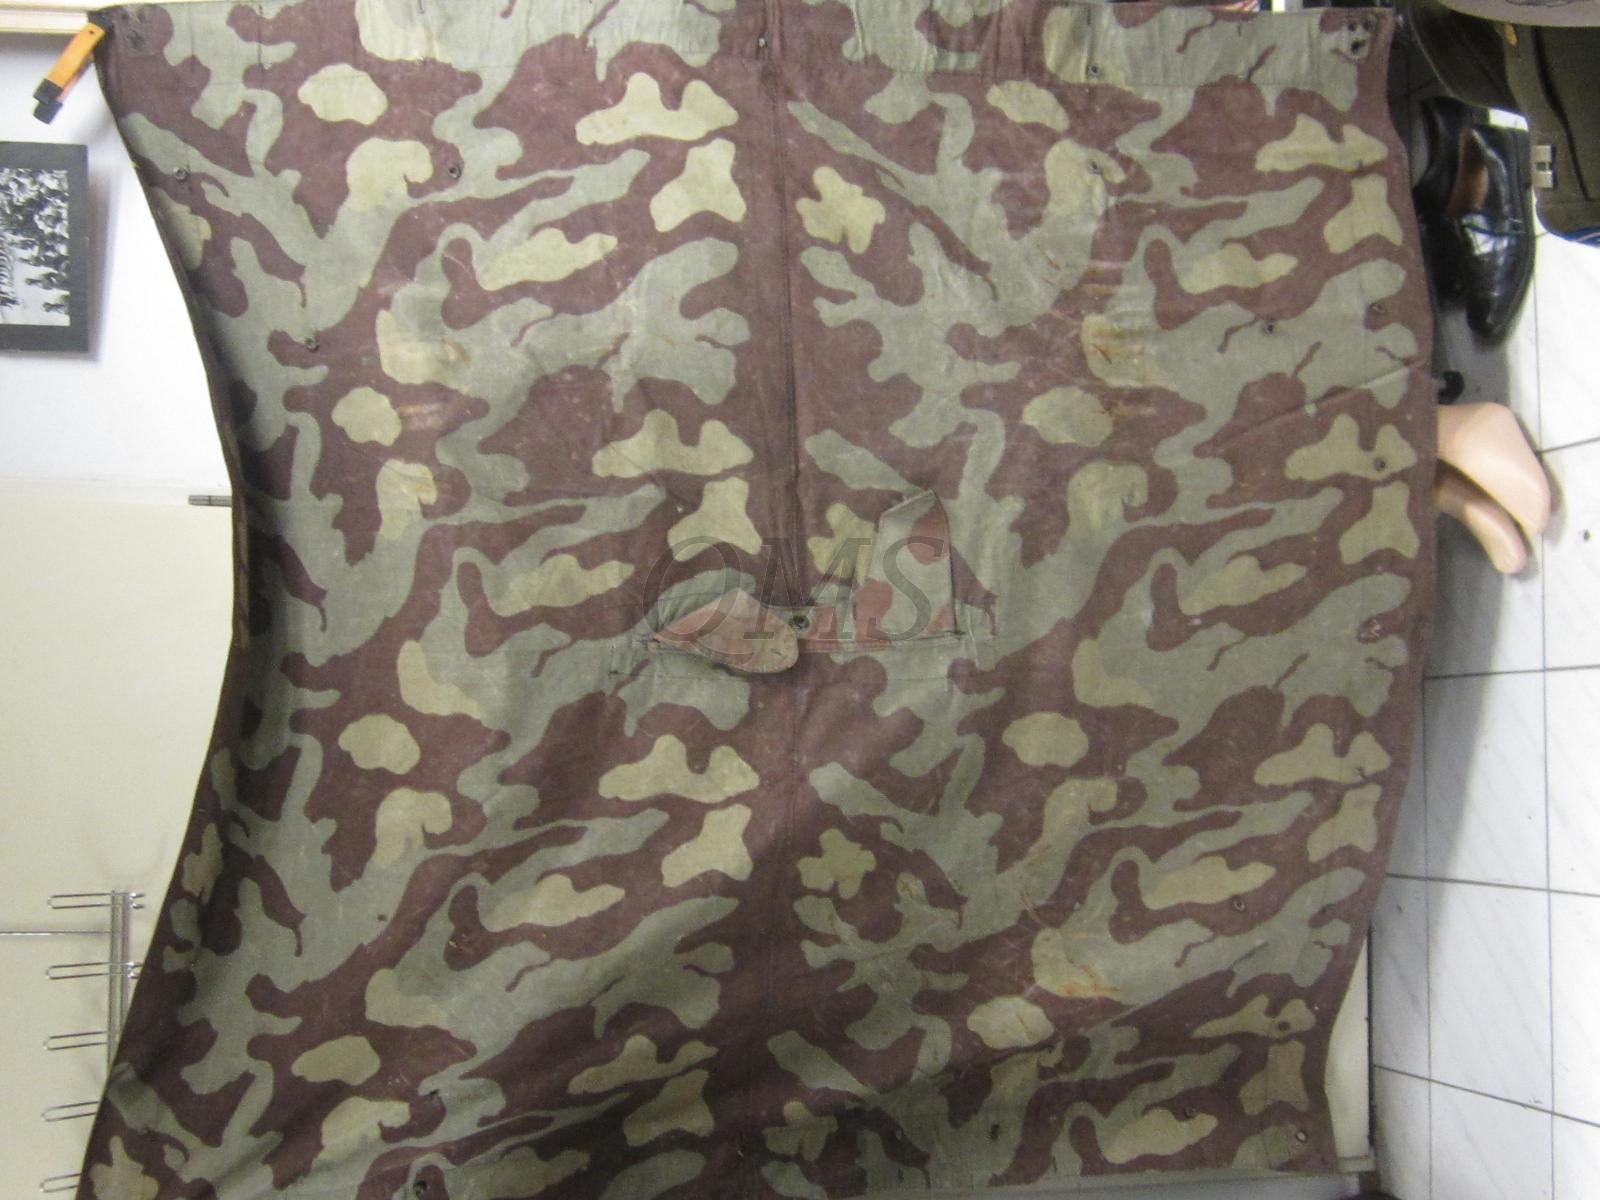 Zeltbahn Italian M1929 (Tenthalf camouflage Italy 1929 pattern)